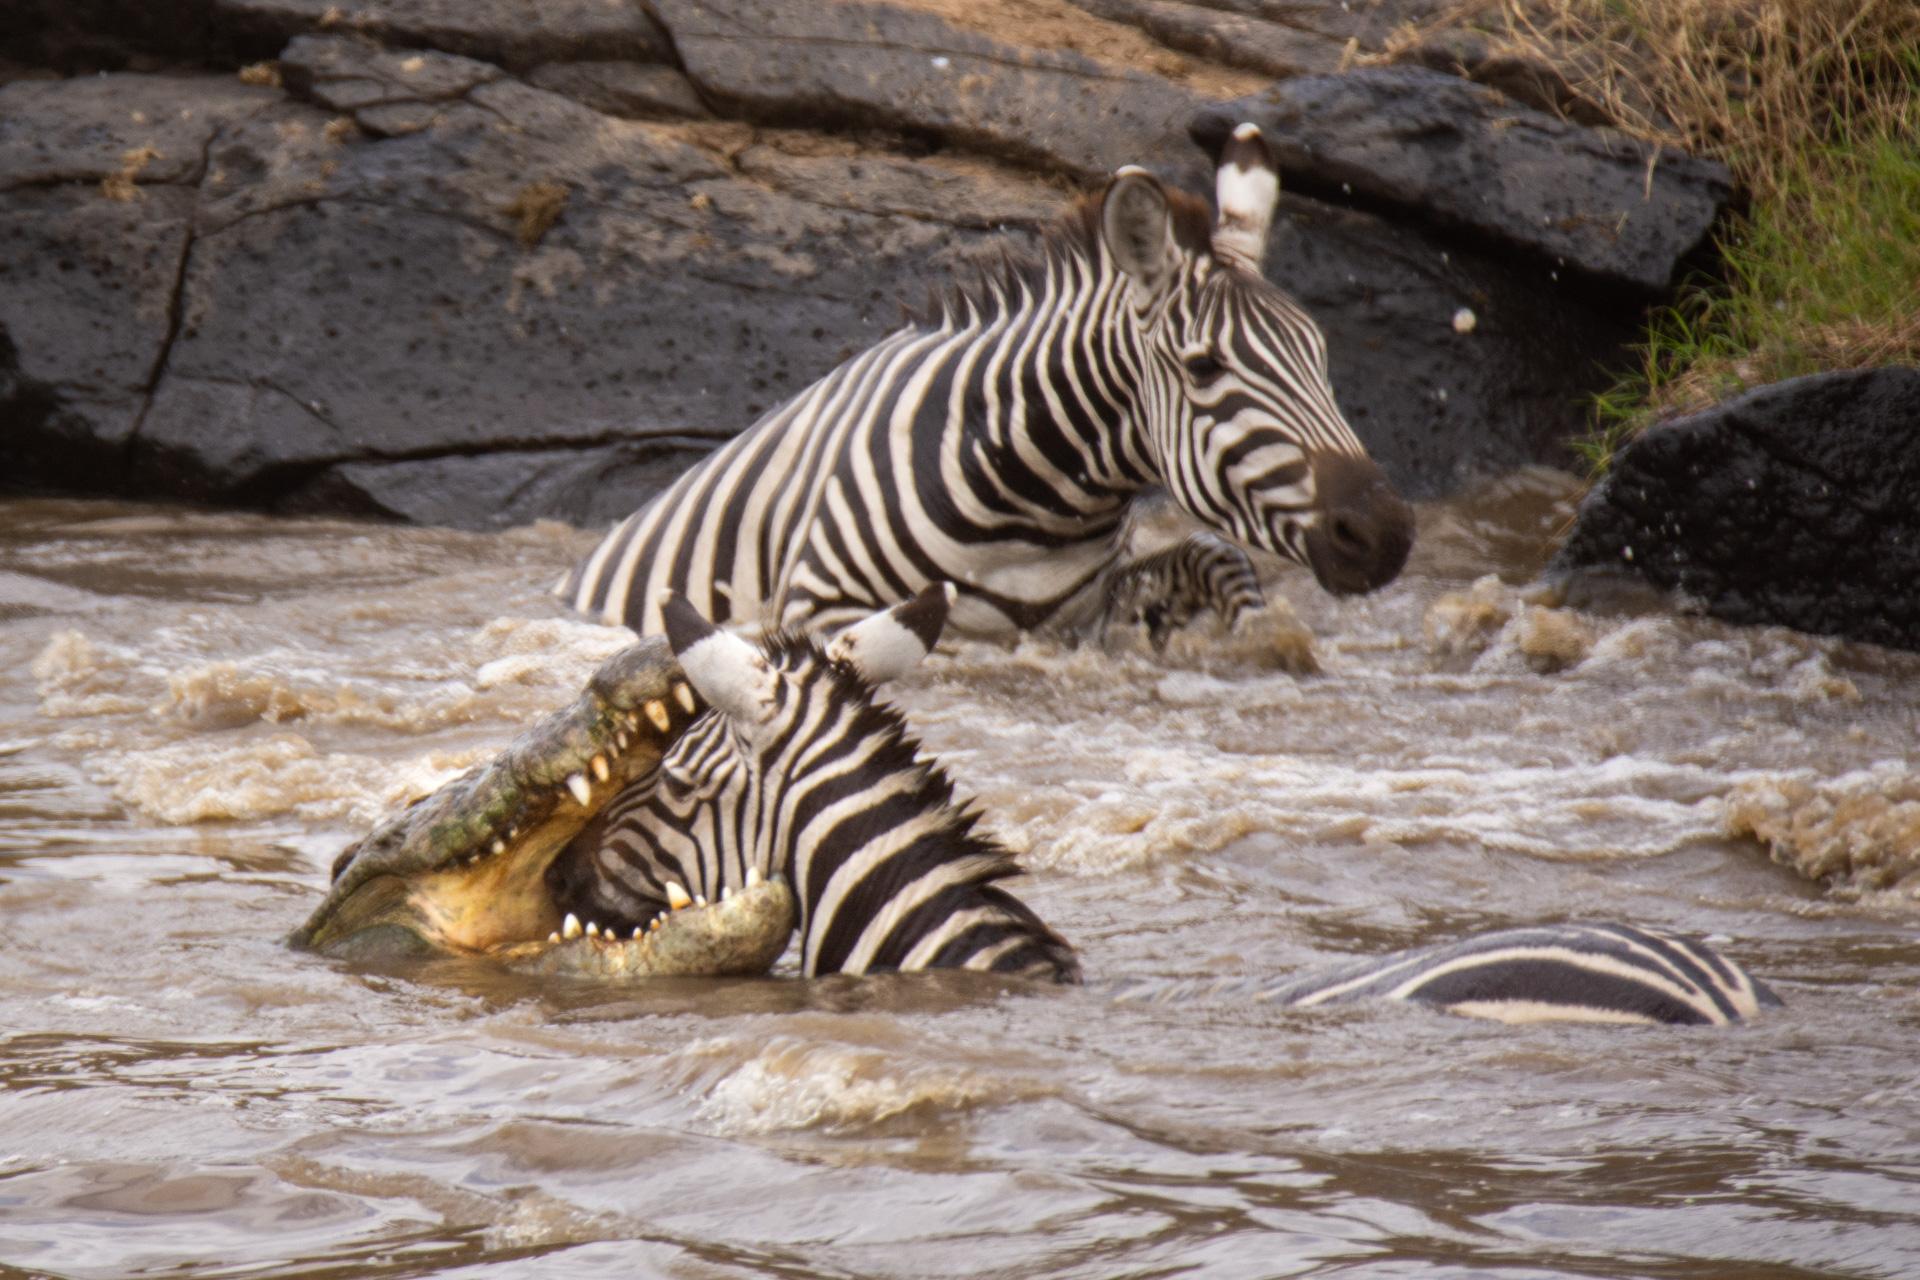 Croc and zebra